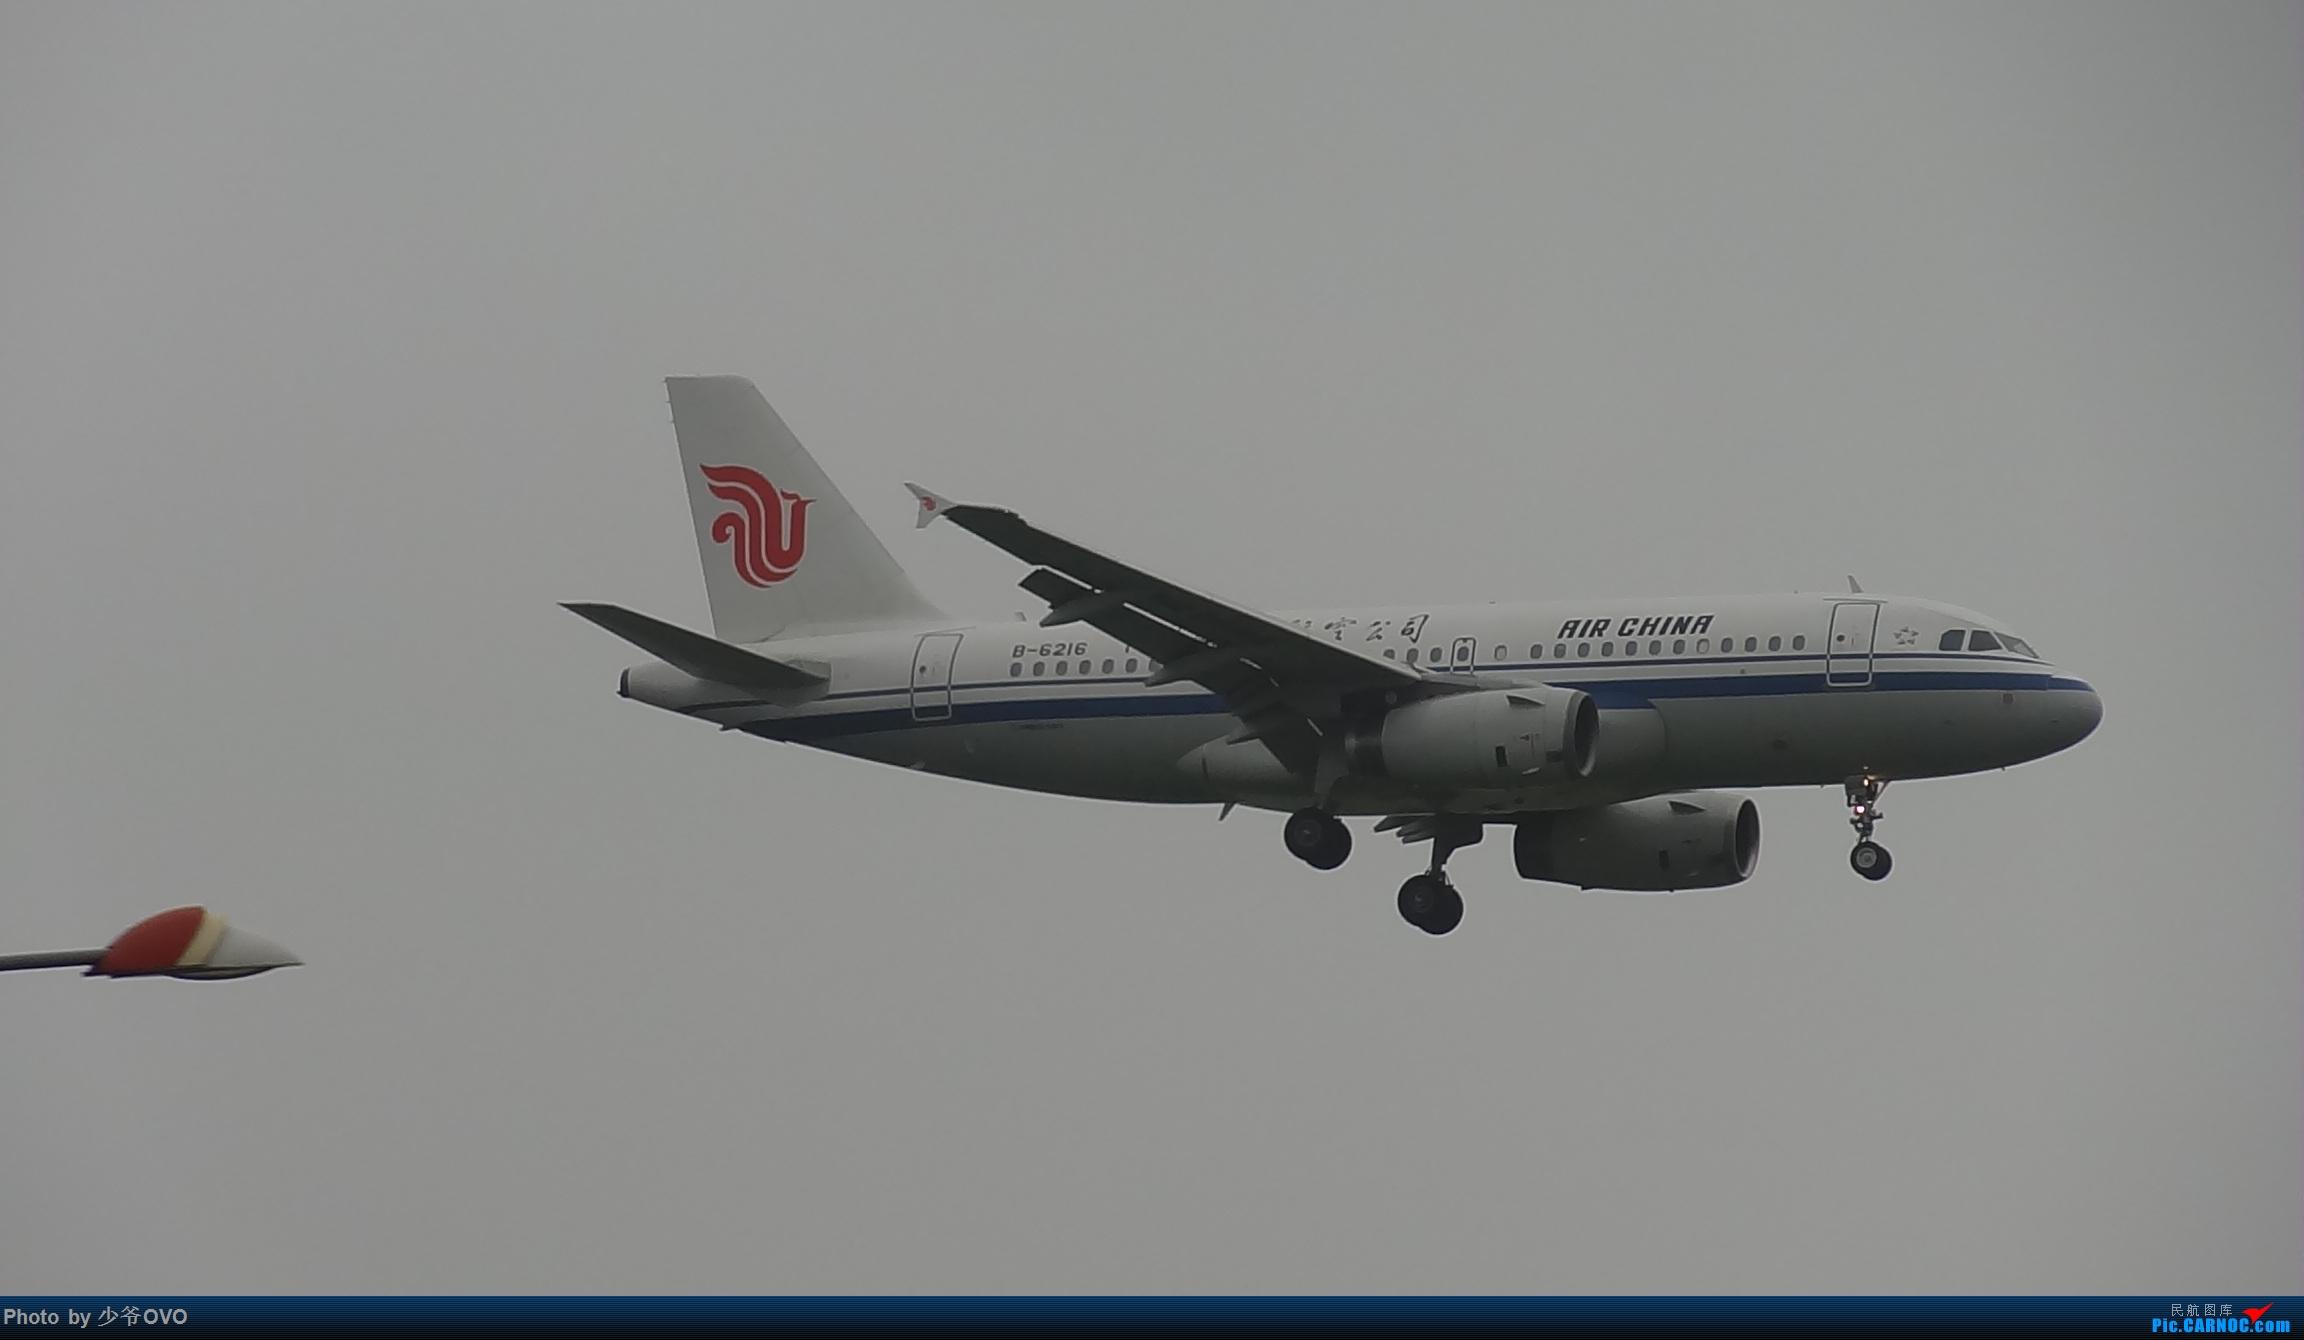 Re:[原创]CKG重庆江北机场拍机 ,渣图一堆,多指点 AIRBUS A319-100 B-6216 中国重庆江北国际机场